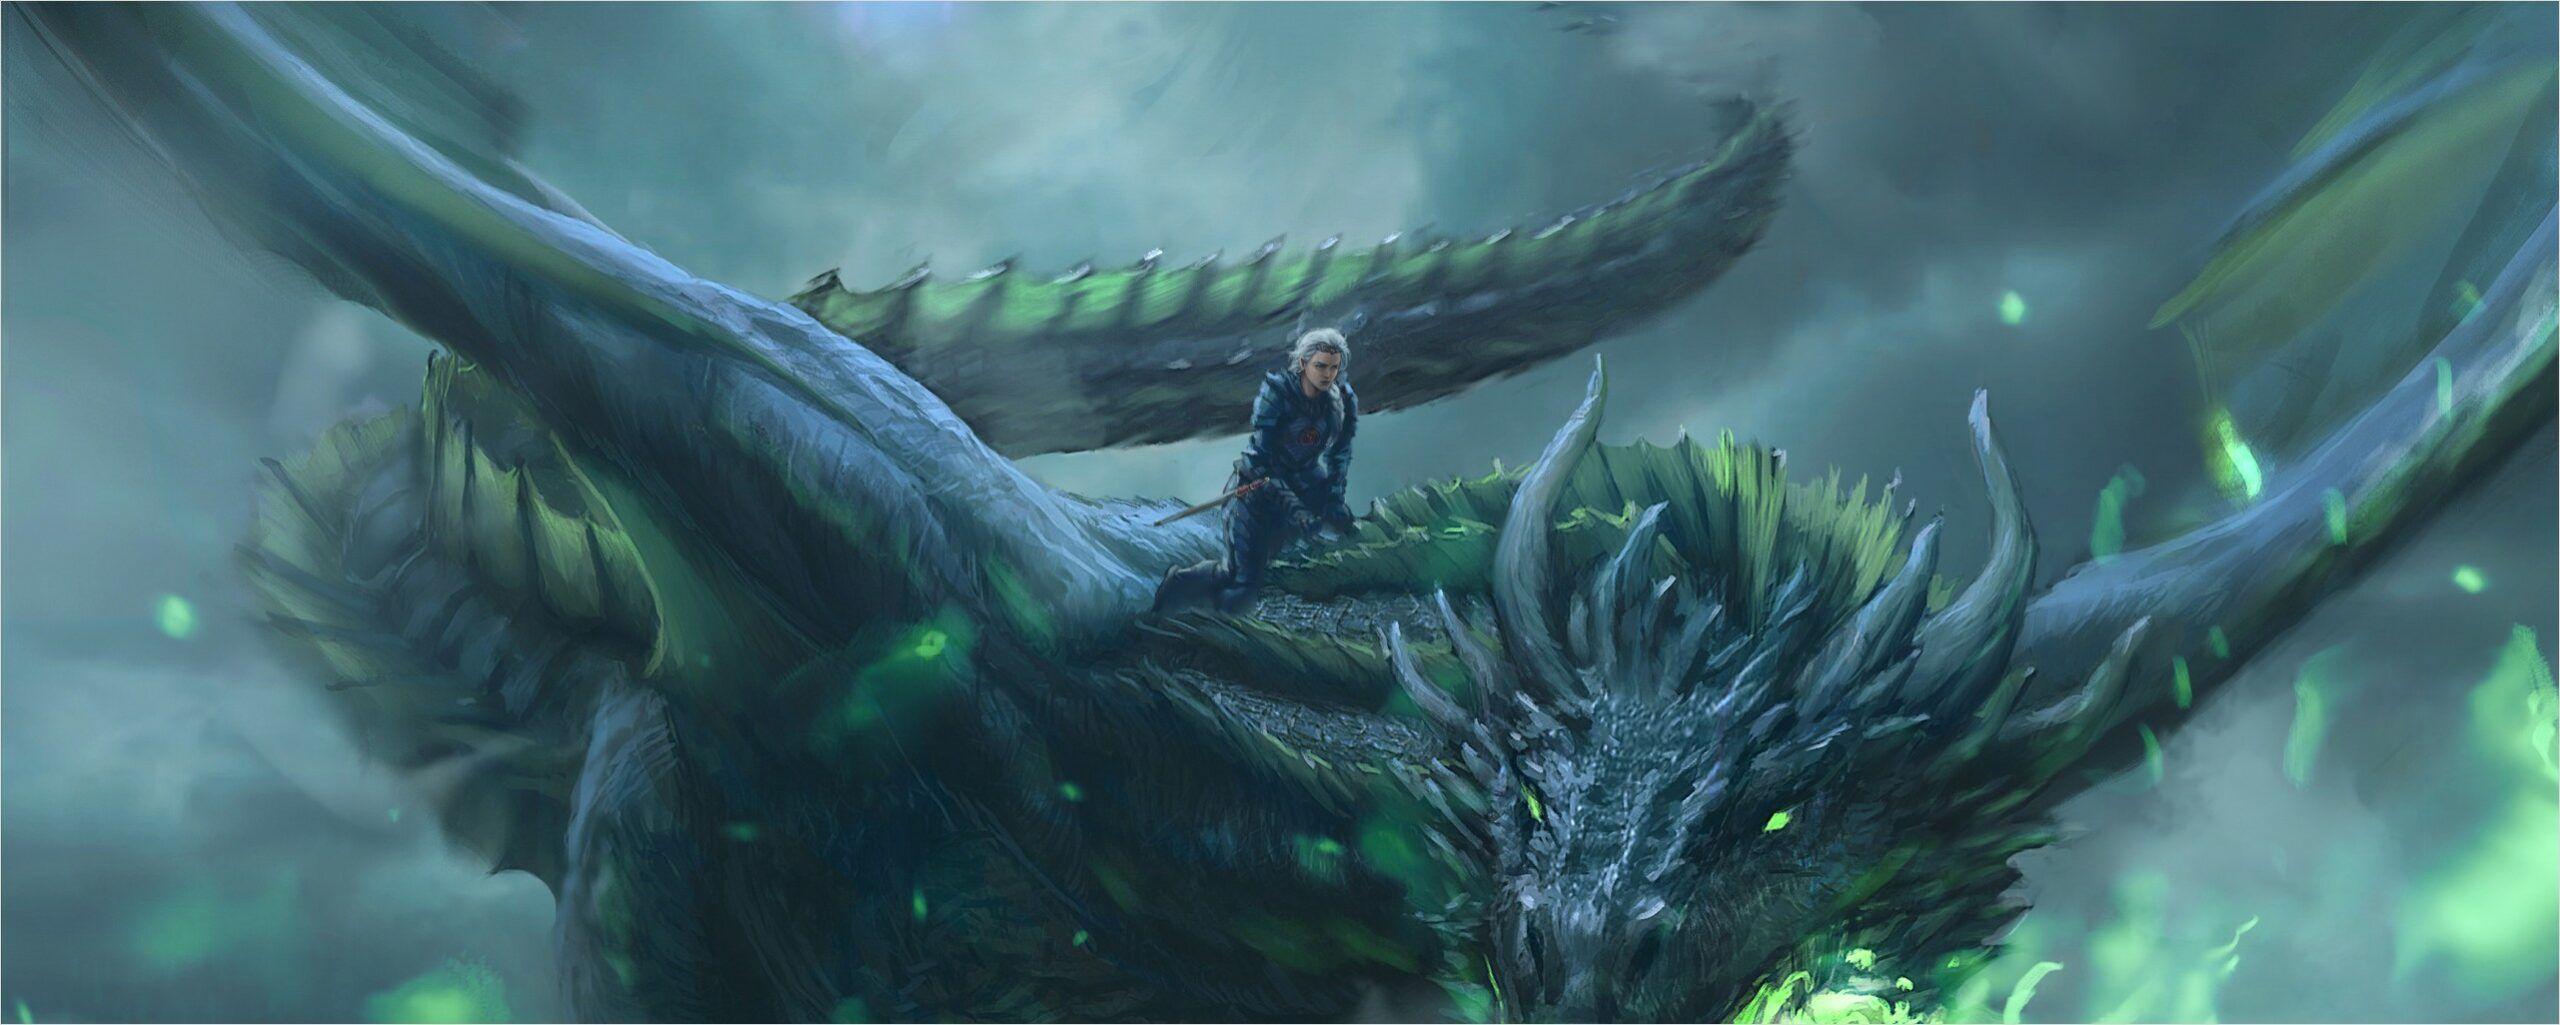 4k Dragons Wallpaper 21 9 In 2020 Wallpaper Dragon Hd Wallpaper